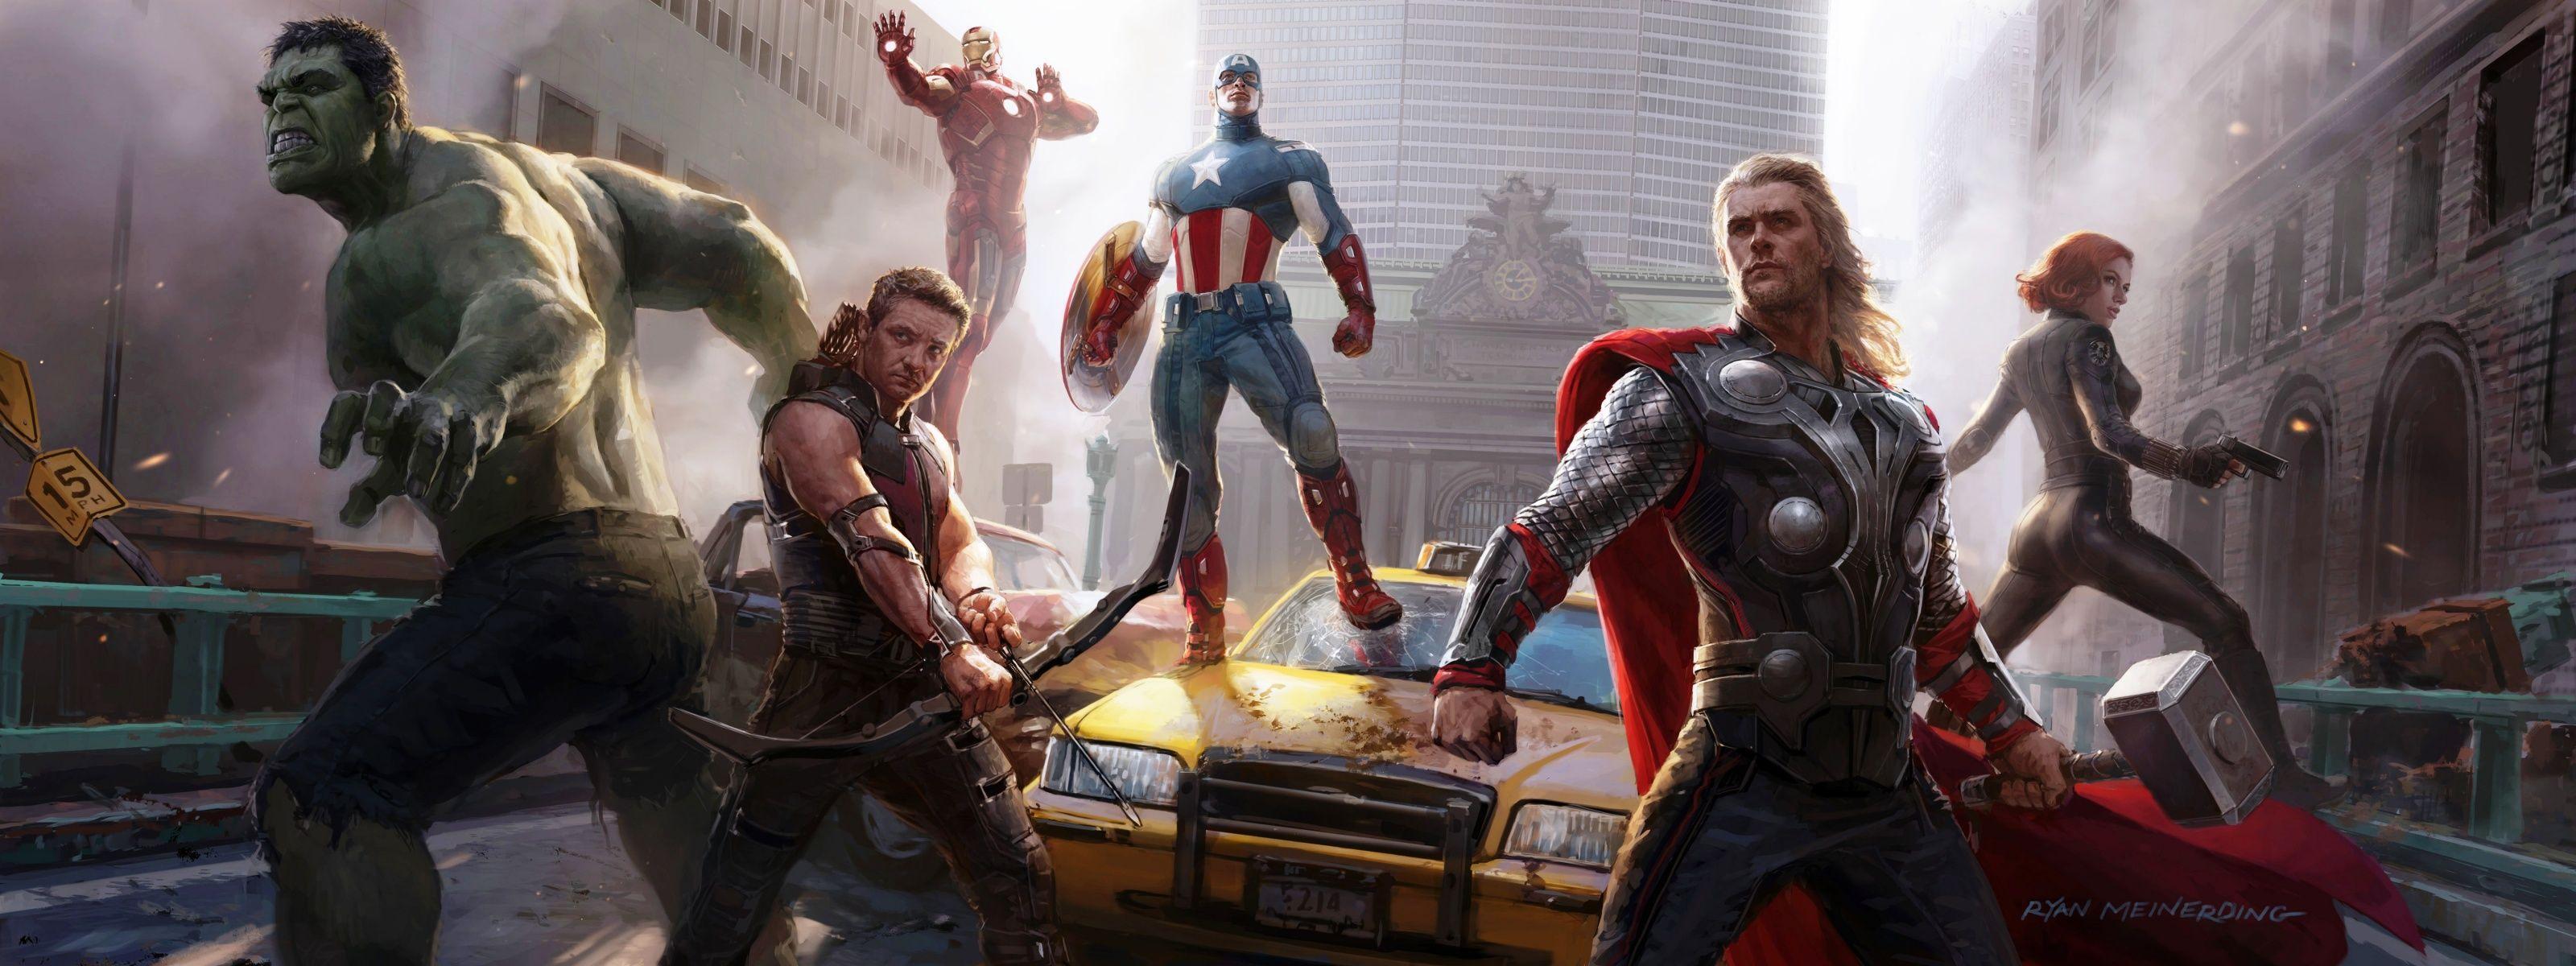 Marvel Dual Screen Wallpapers Top Free Marvel Dual Screen